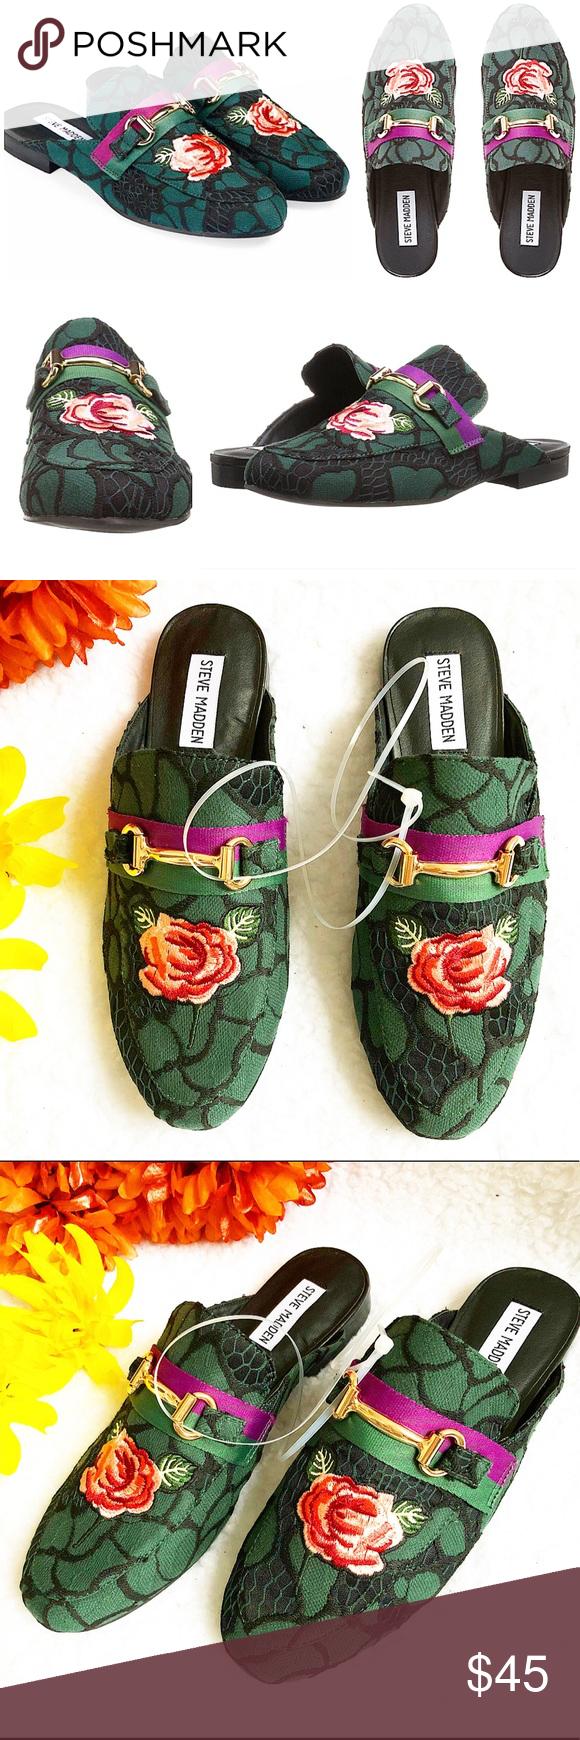 c703b5210c7 🆕Steve Madden Green Kandi Rose Mule Shoe Size 8.5 So versatile